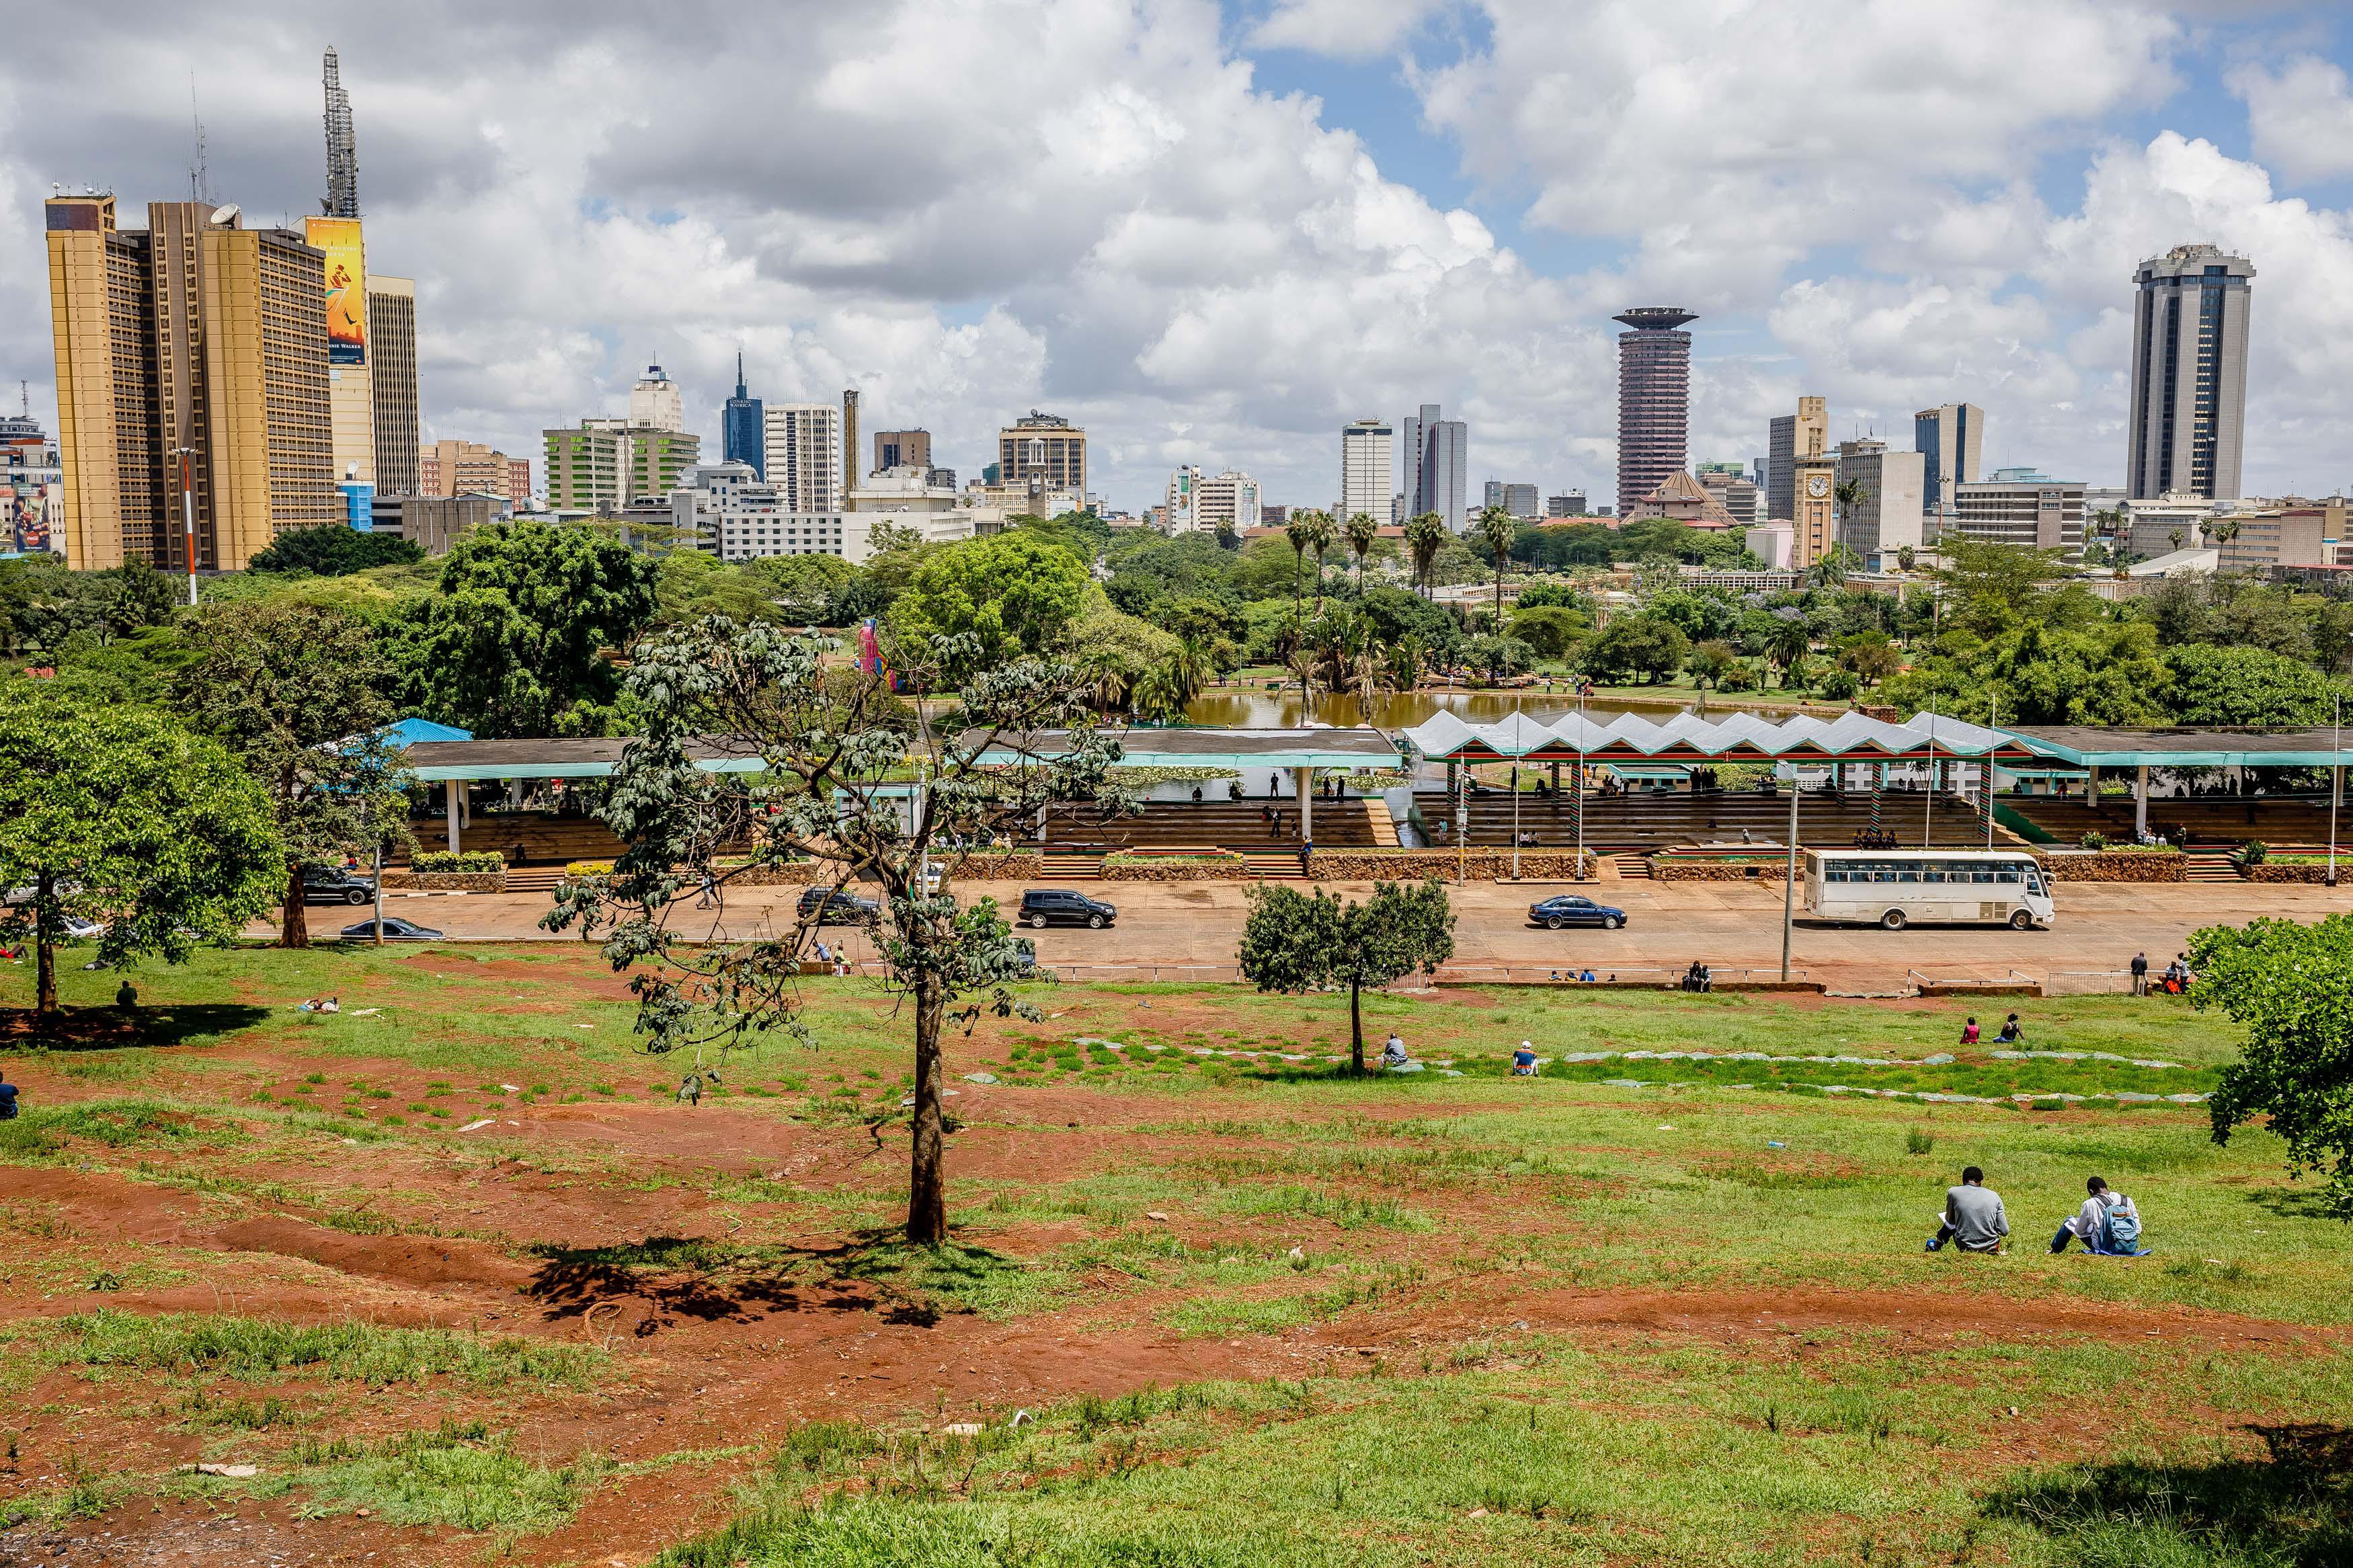 The Nairobi skyline, as seen from Uhuru Park viewpoint.